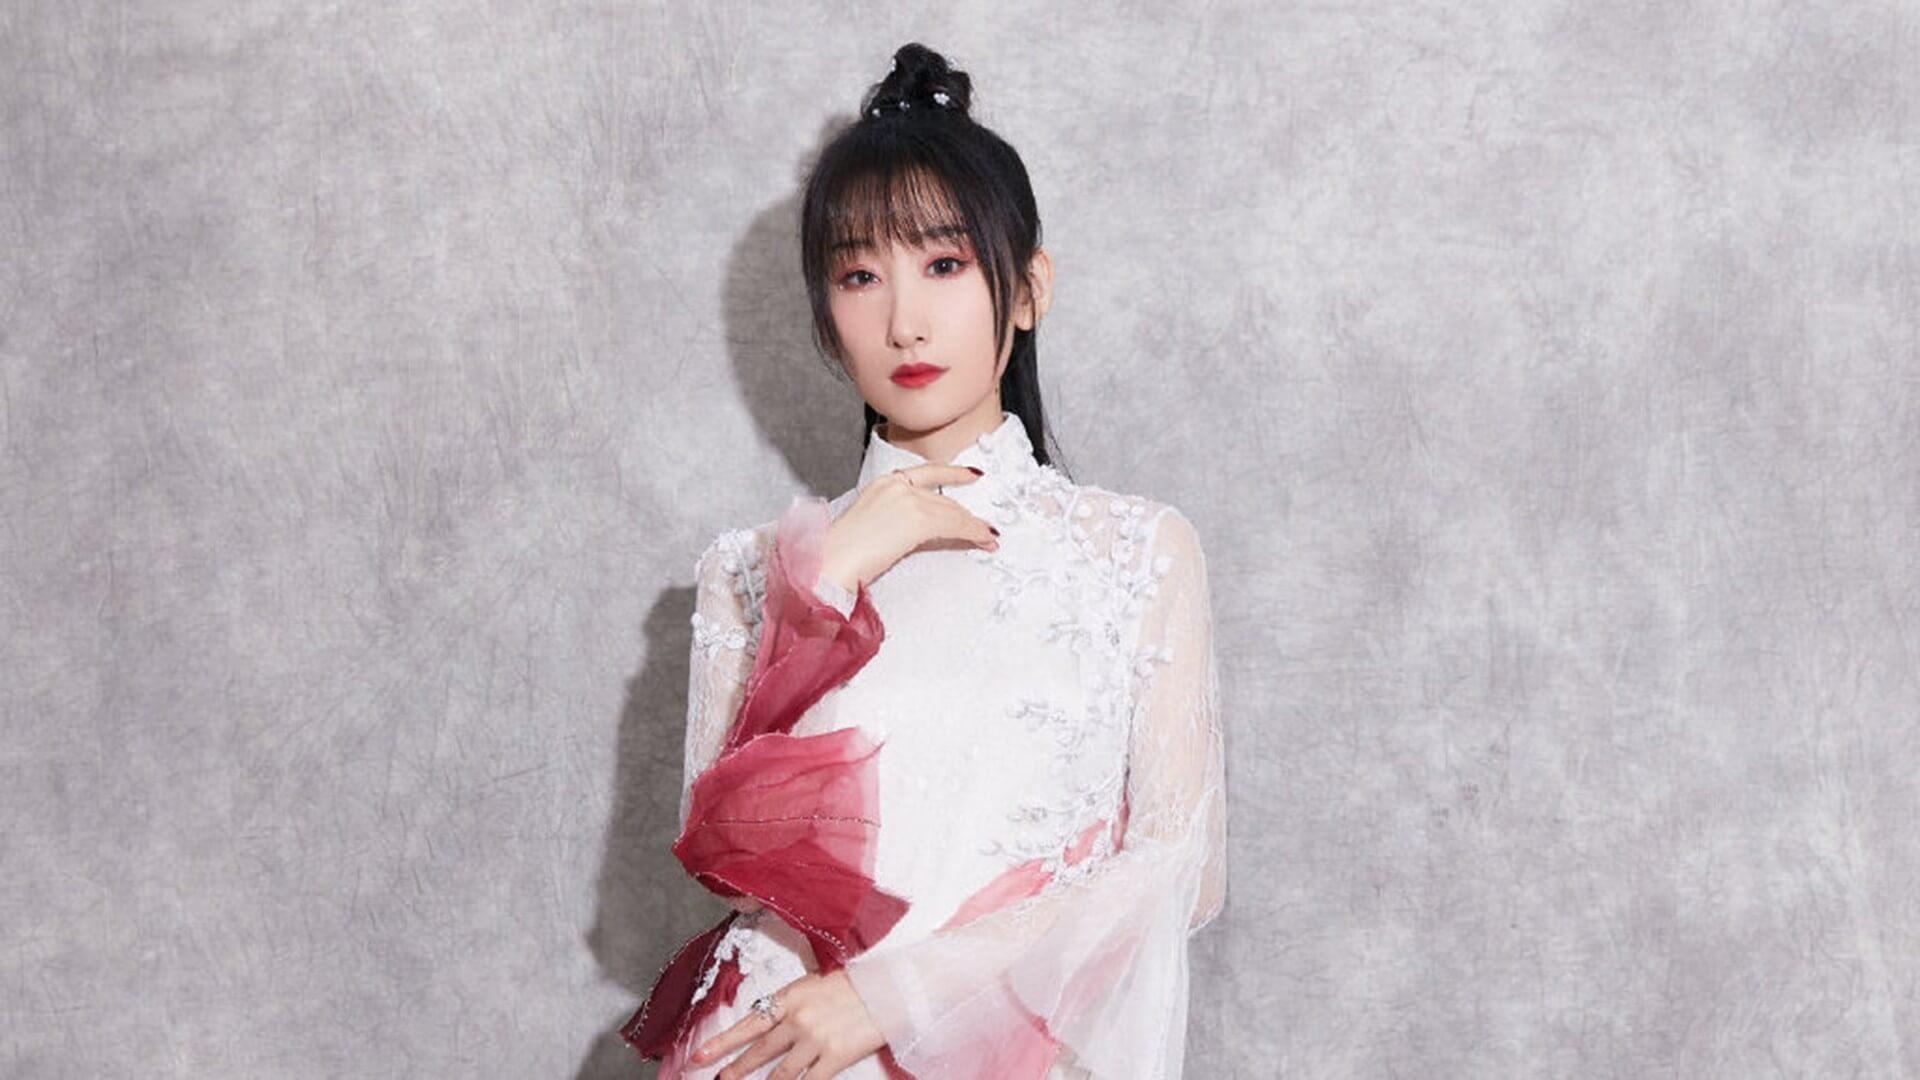 Nan Du 难渡 Difficult To Cross Lyrics 歌詞 With Pinyin By Deng Shen Me Jun 等什么君